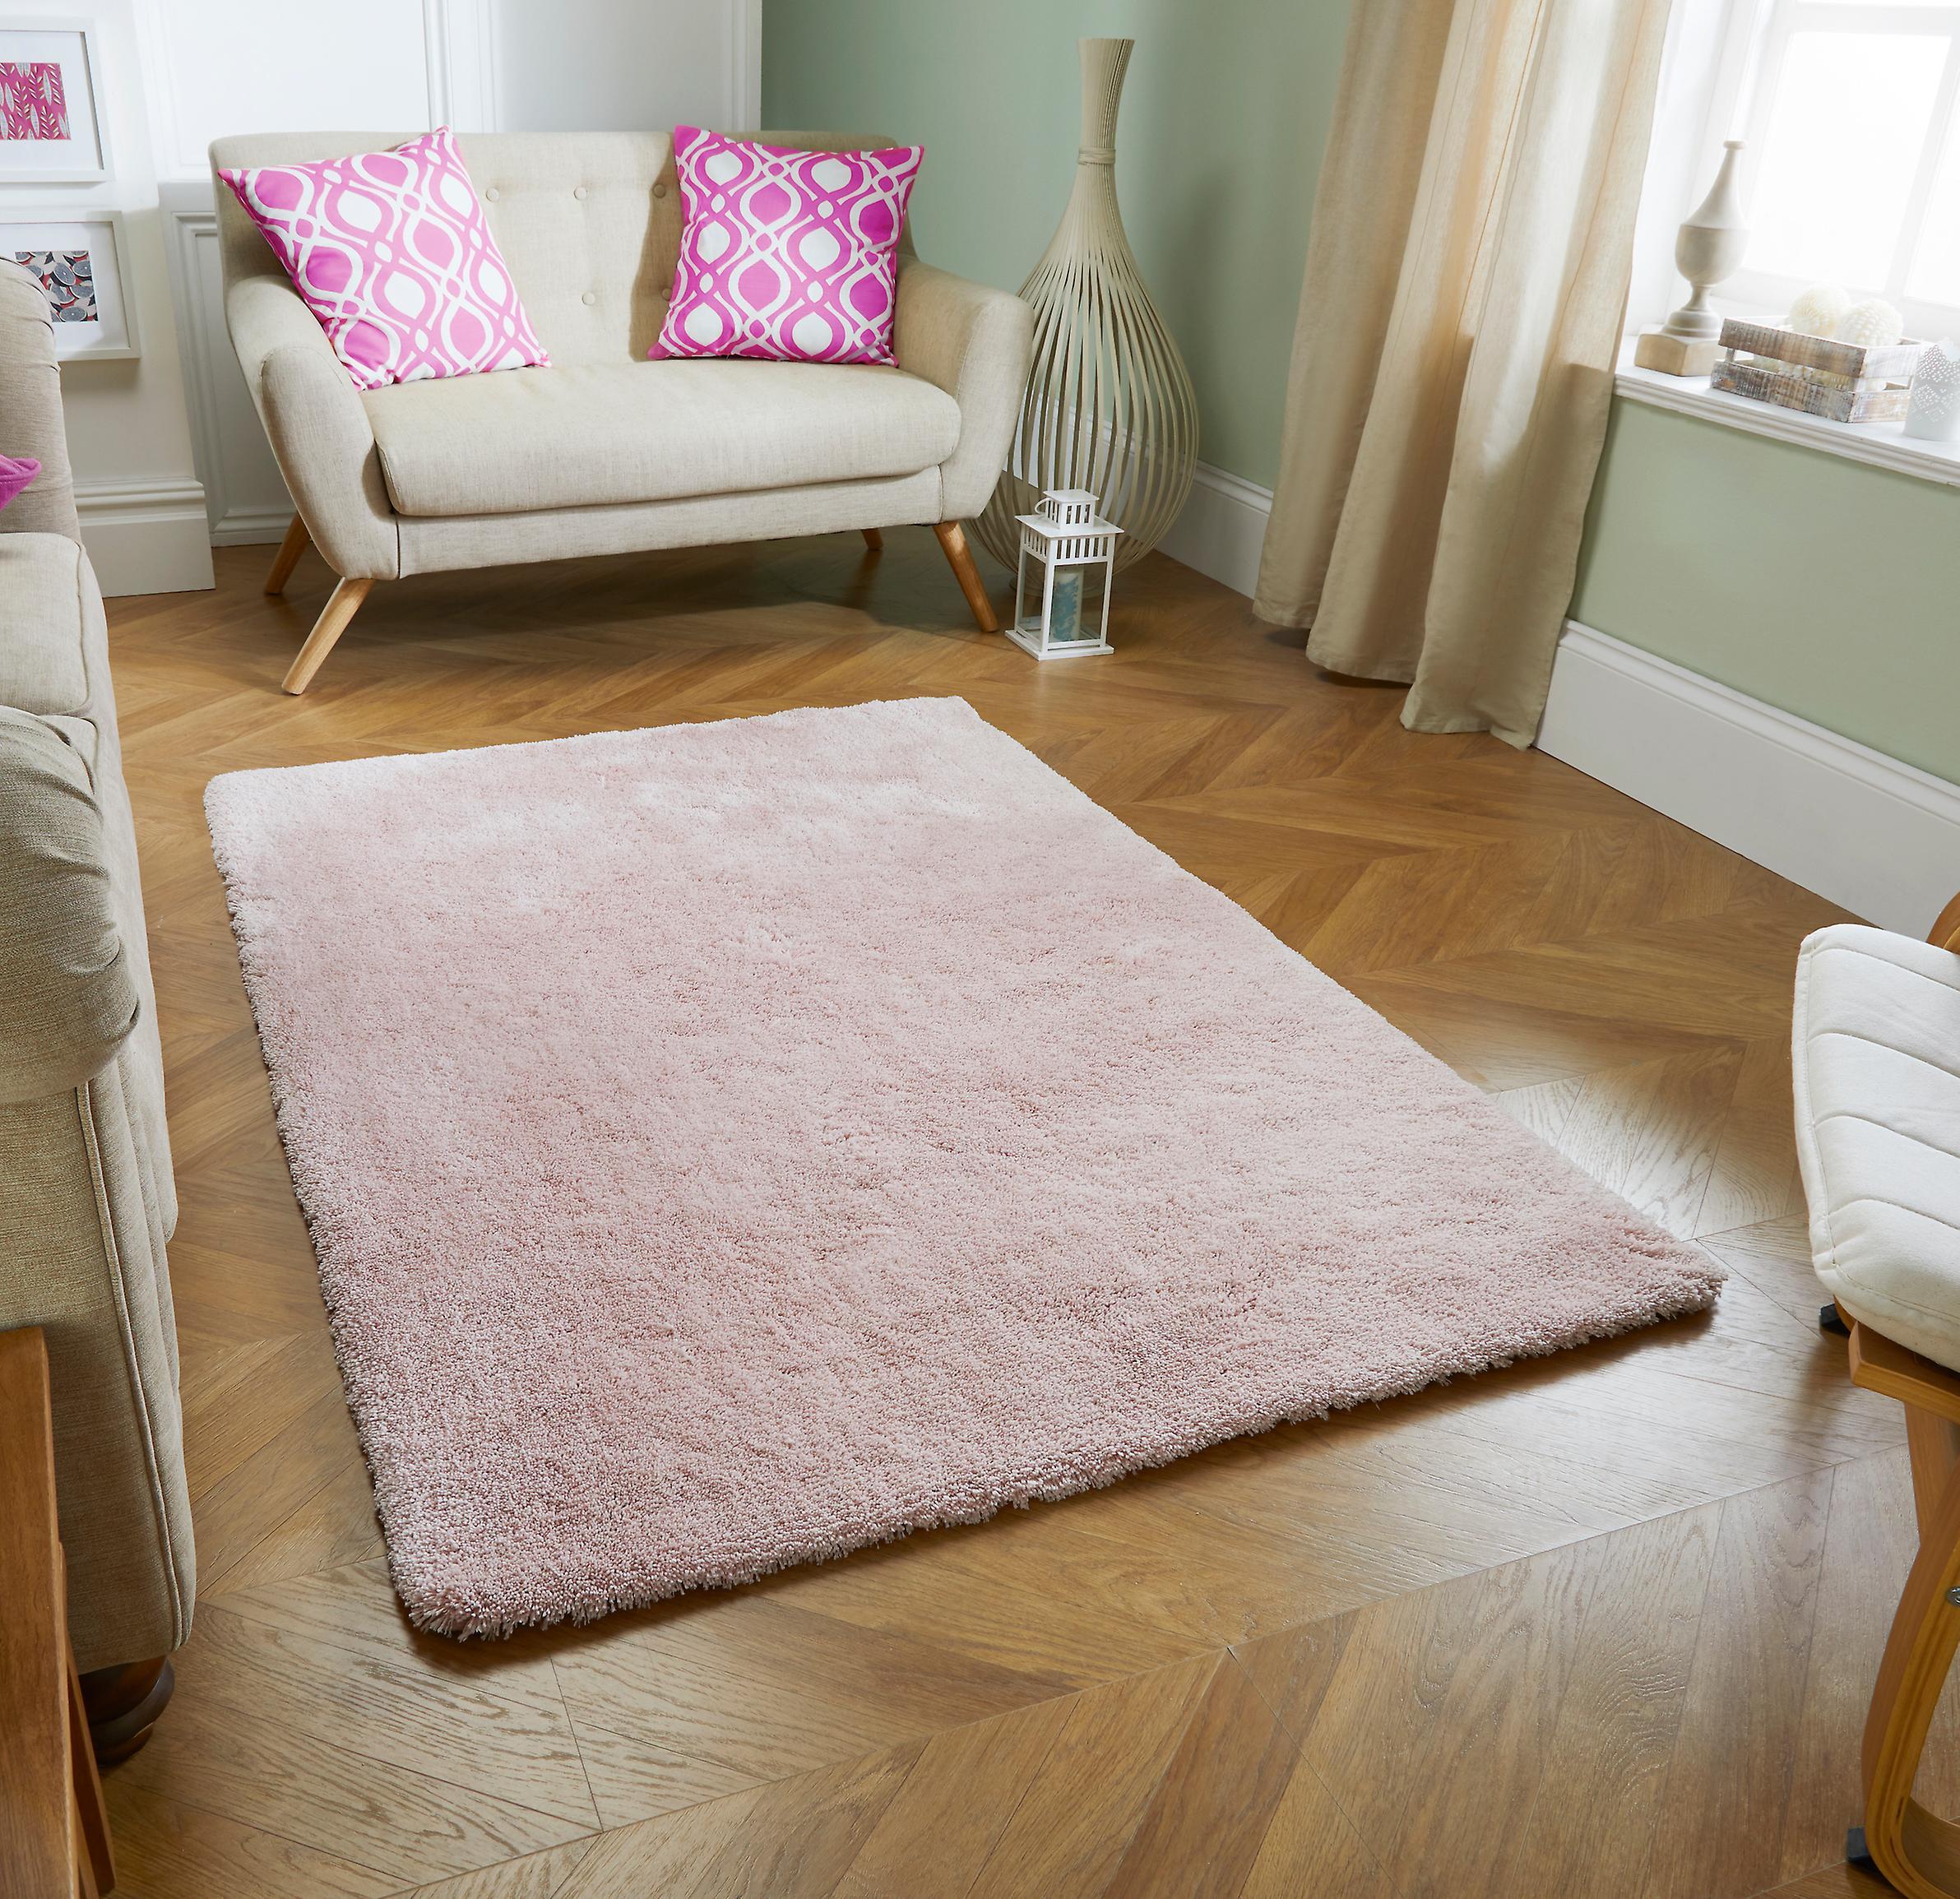 Tapis douceur rose Rectangle tapis Plain presque ordinaire